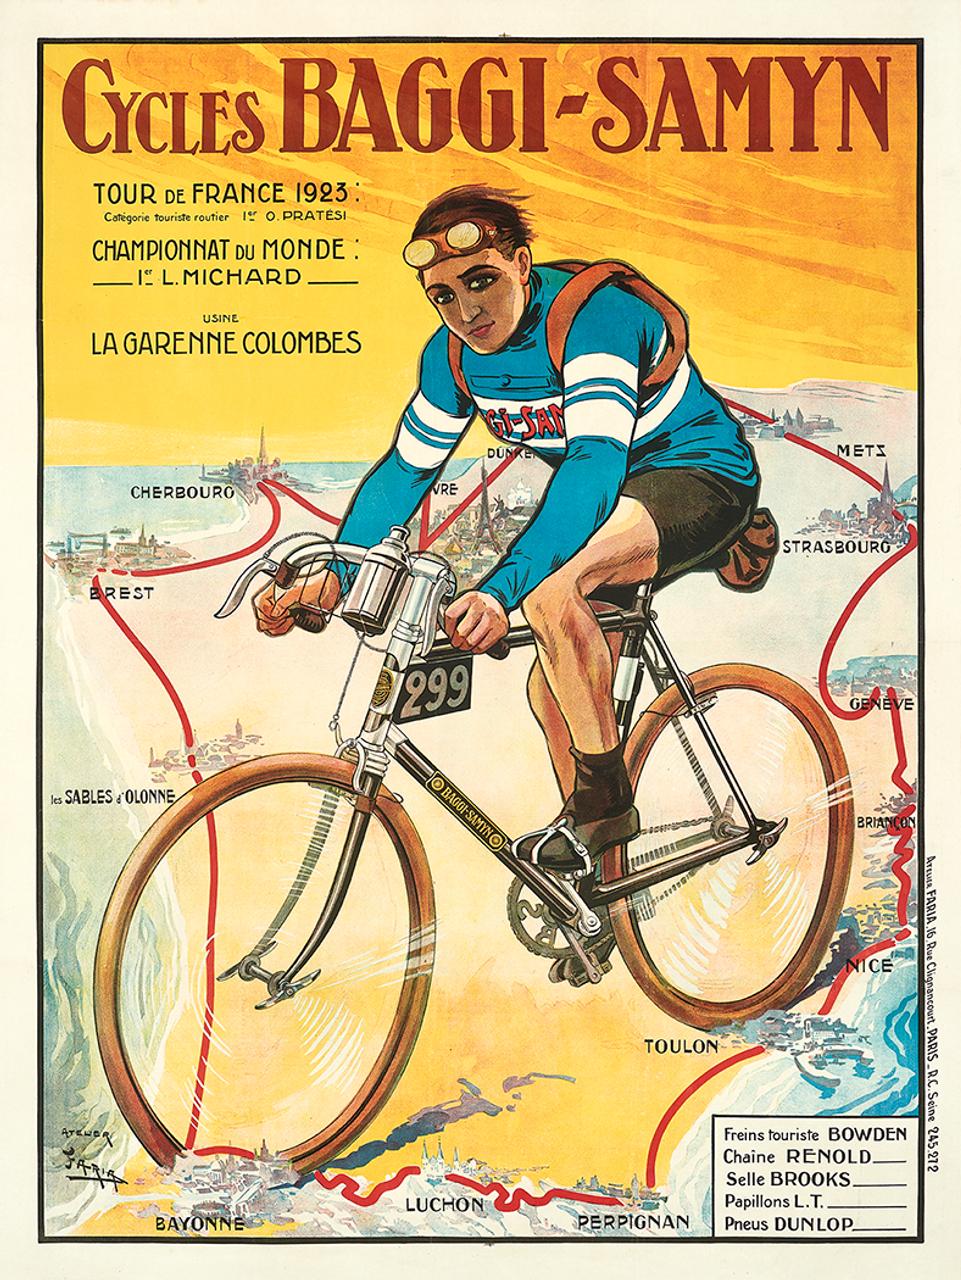 1923 Baggy-Samyn Tour De France Bicycle Poster